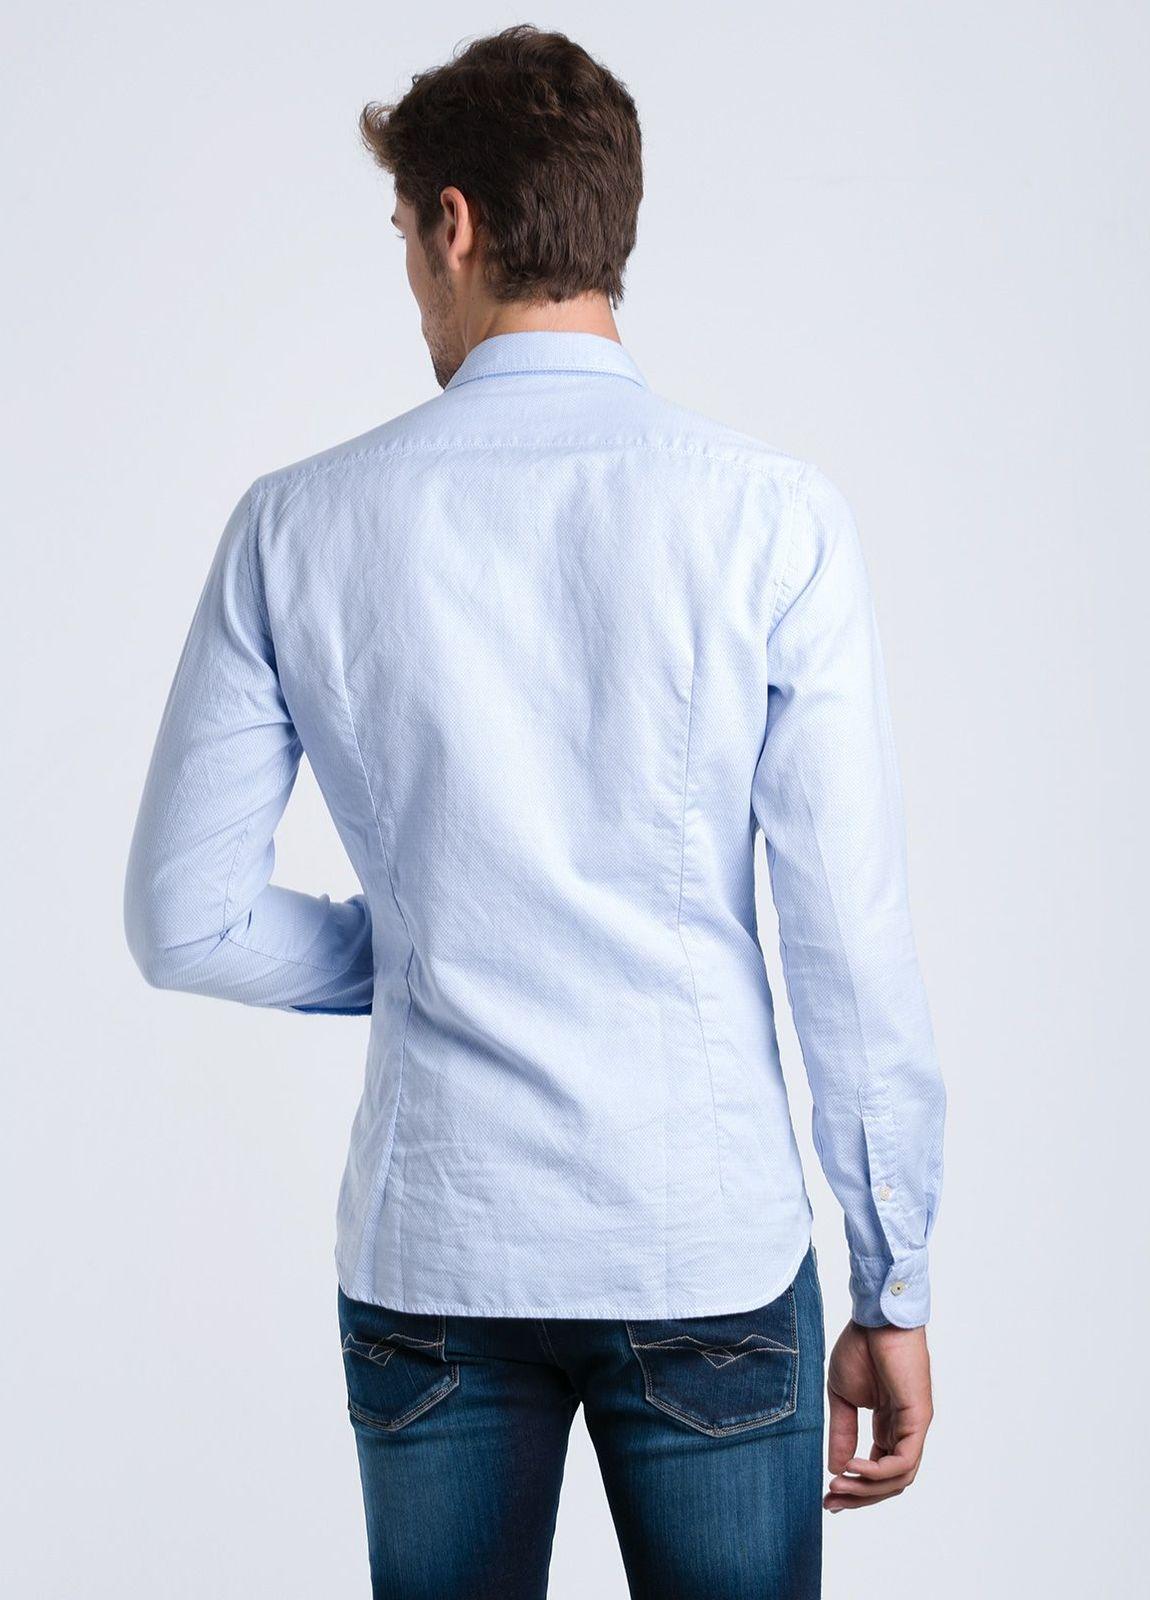 Camisa sport lisa SLIM FIT color celeste con textura, 100% Algodón. - Ítem1